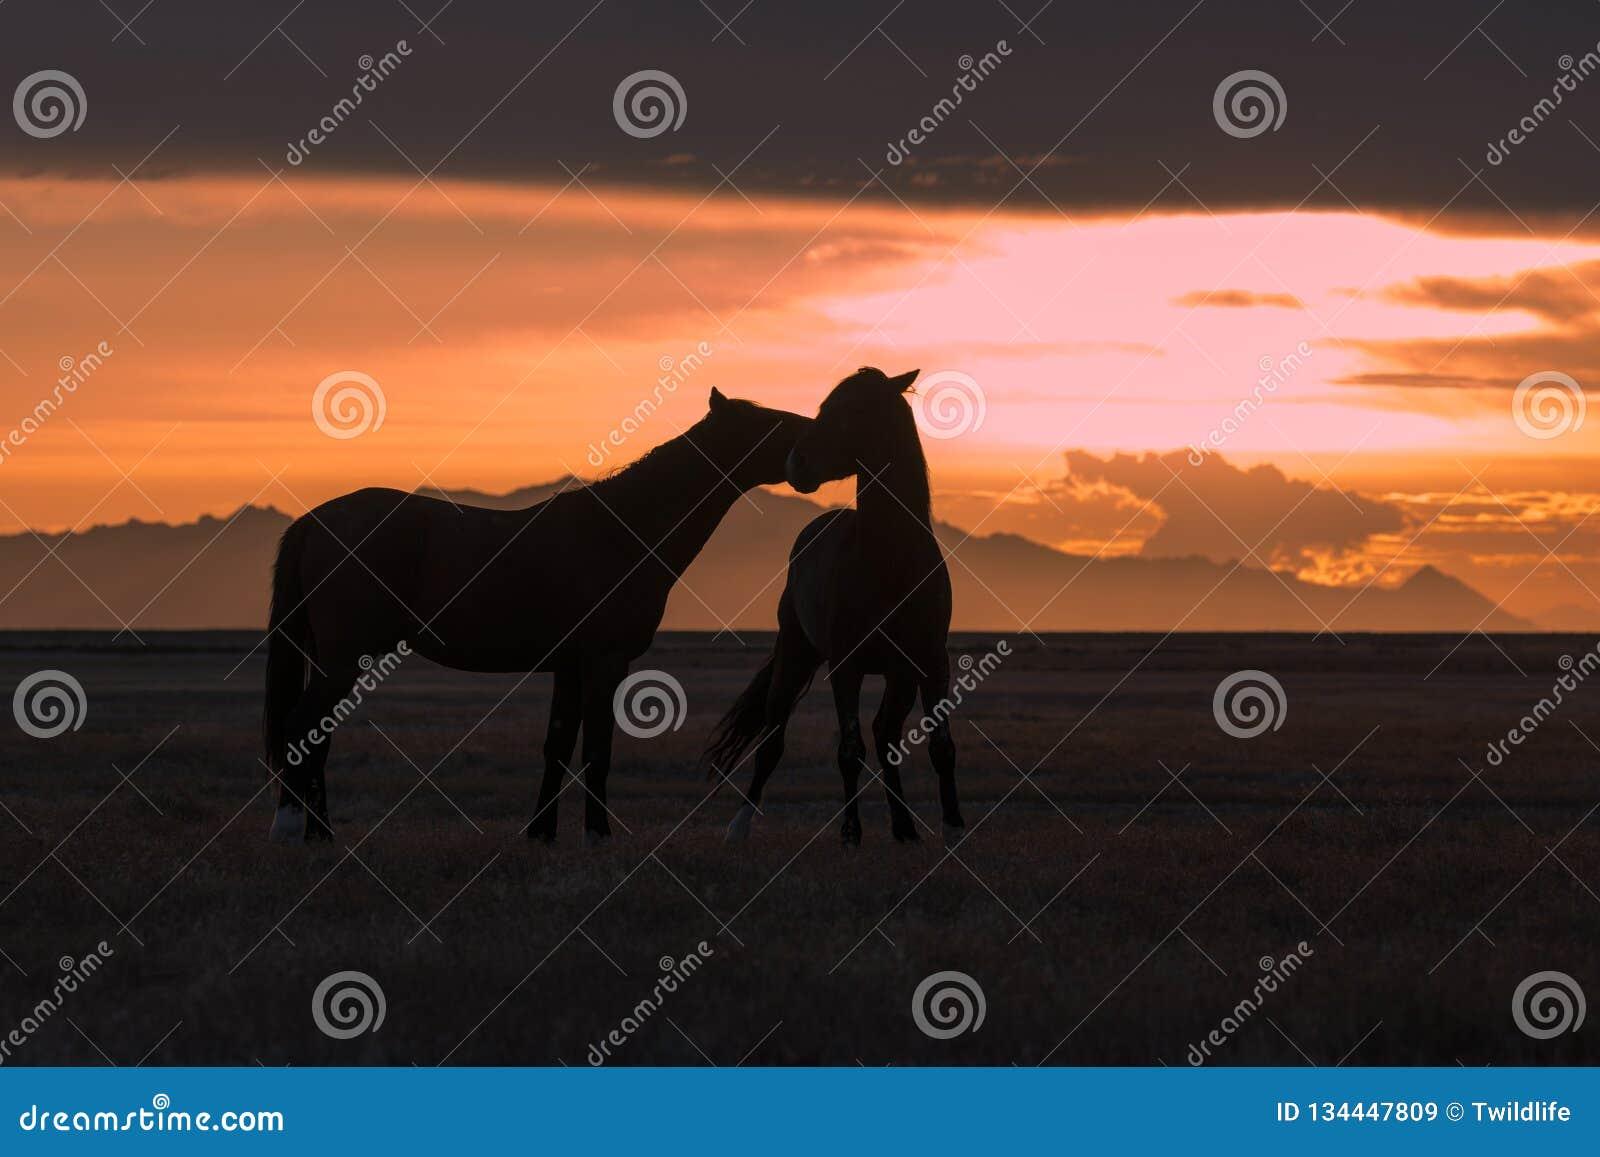 Wilde Pferde silhouettierten bei Sonnenuntergang in der Wüste